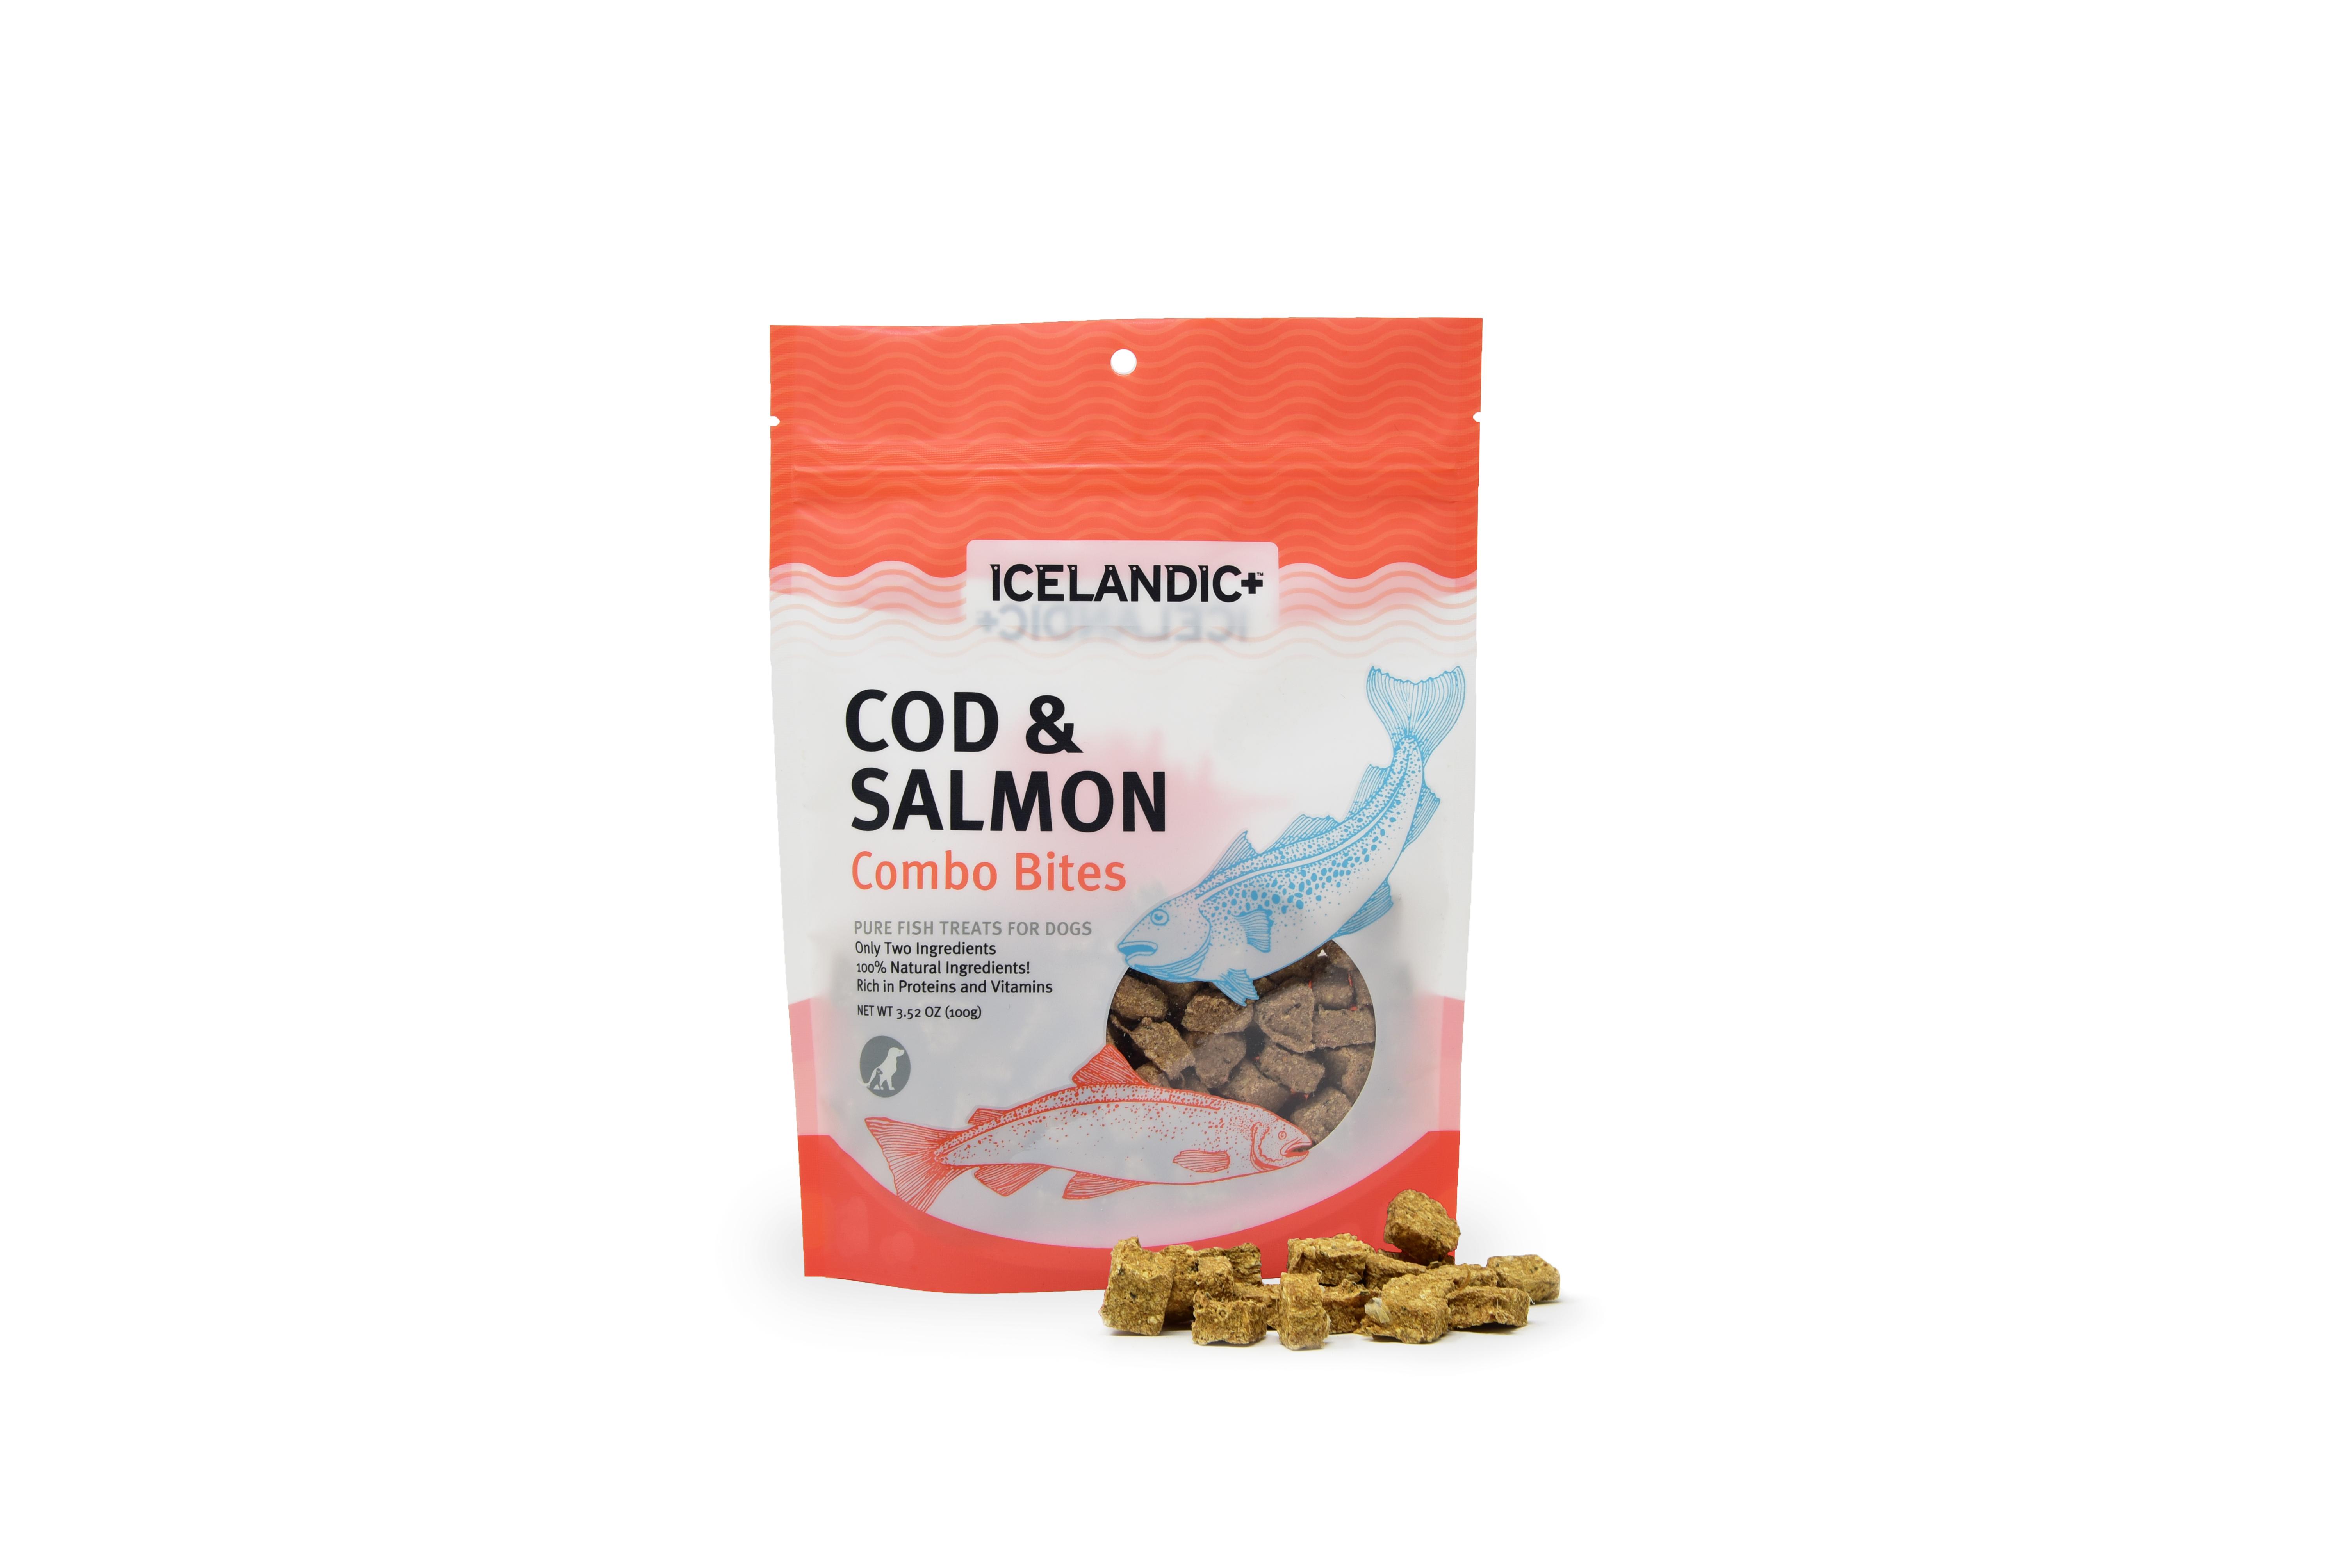 Icelandic+ Combo Fish Bites Dog Treat, Cod & Salmon, 3.52-oz bag